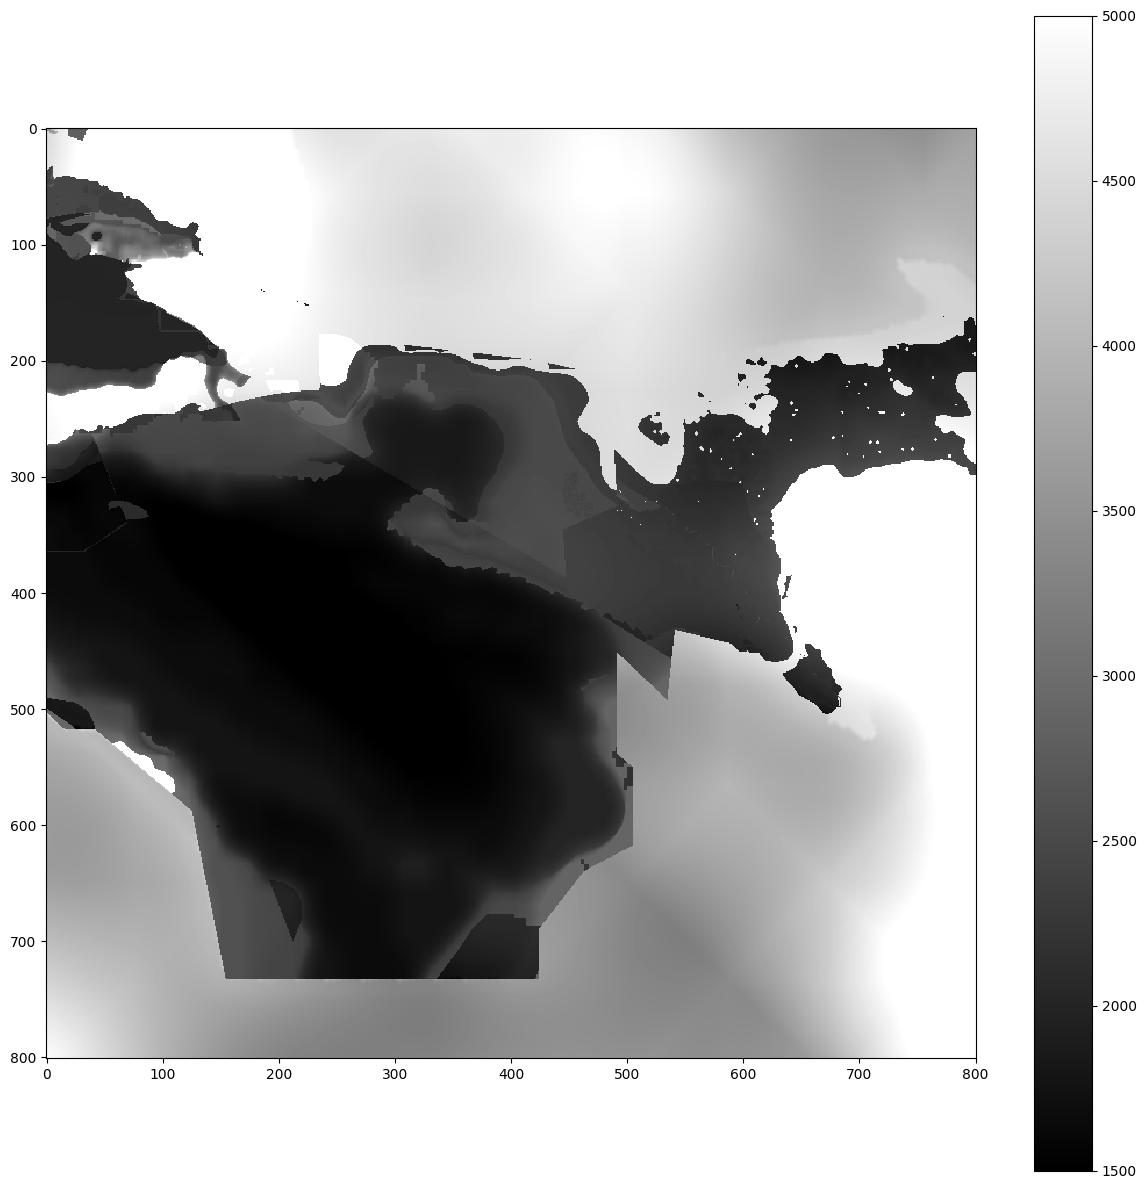 bench/seismic/wp/la_habra/meshes/velocity_model/plots/vp_250.png